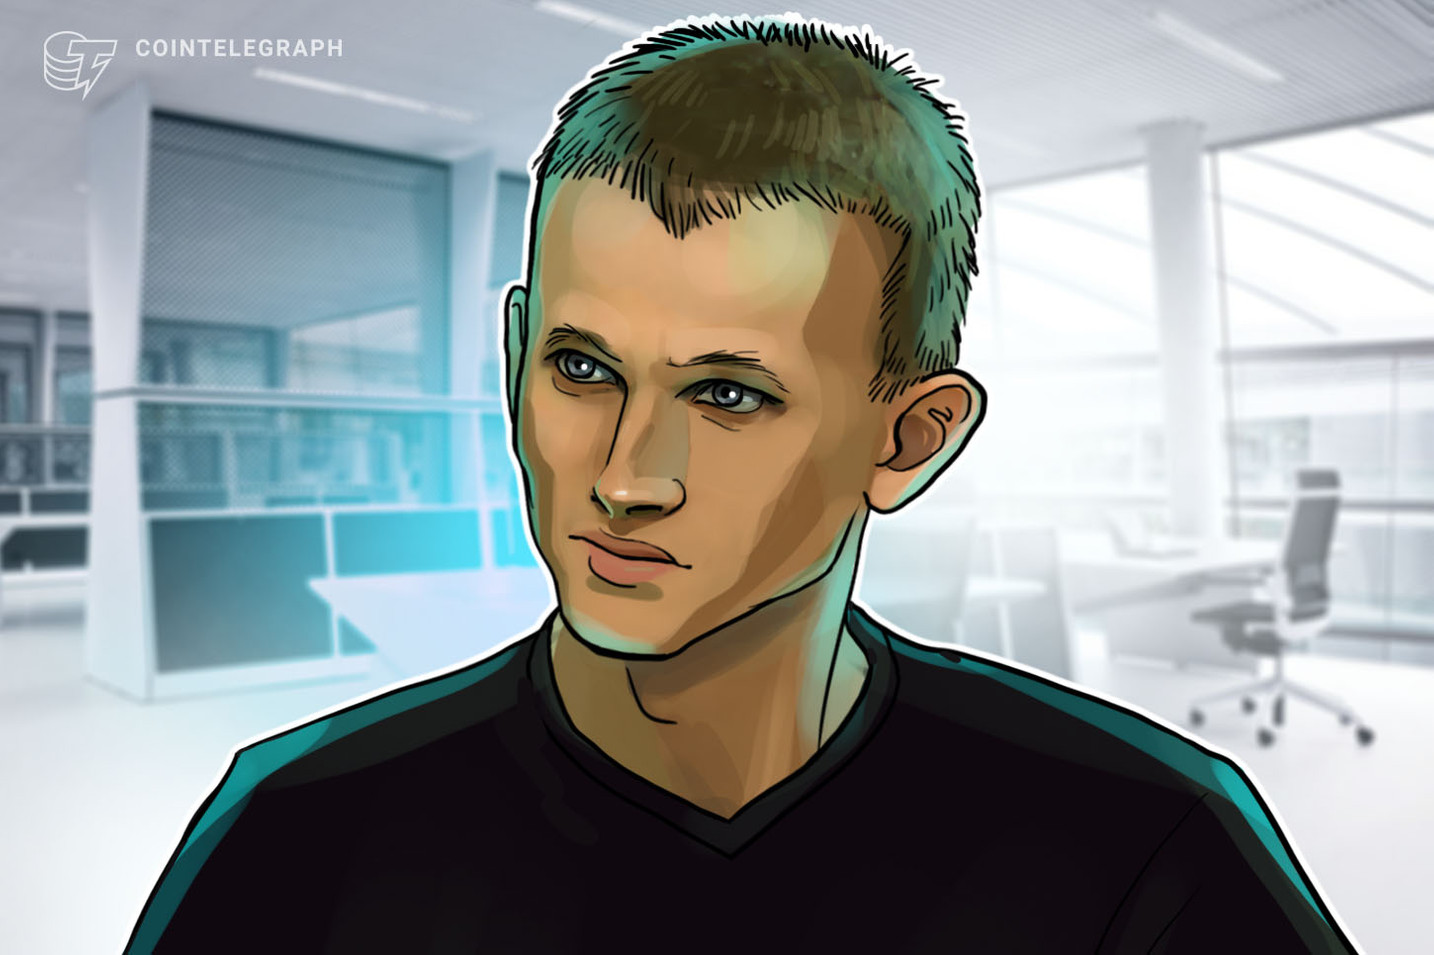 Vitalik thinks token-based decentralized governance is holding DeFi back